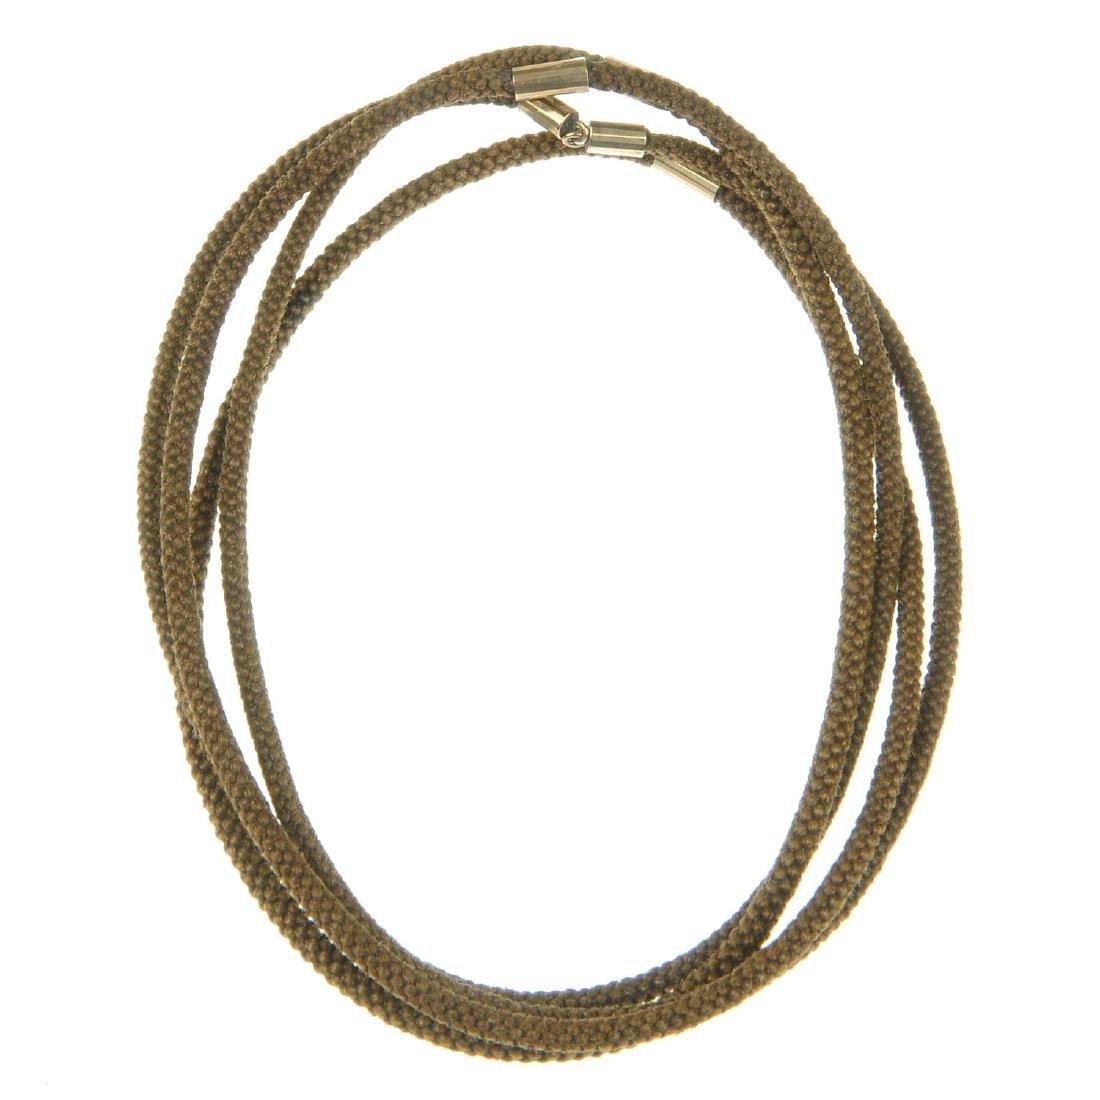 A late Victorian woven hair chain. The long-length